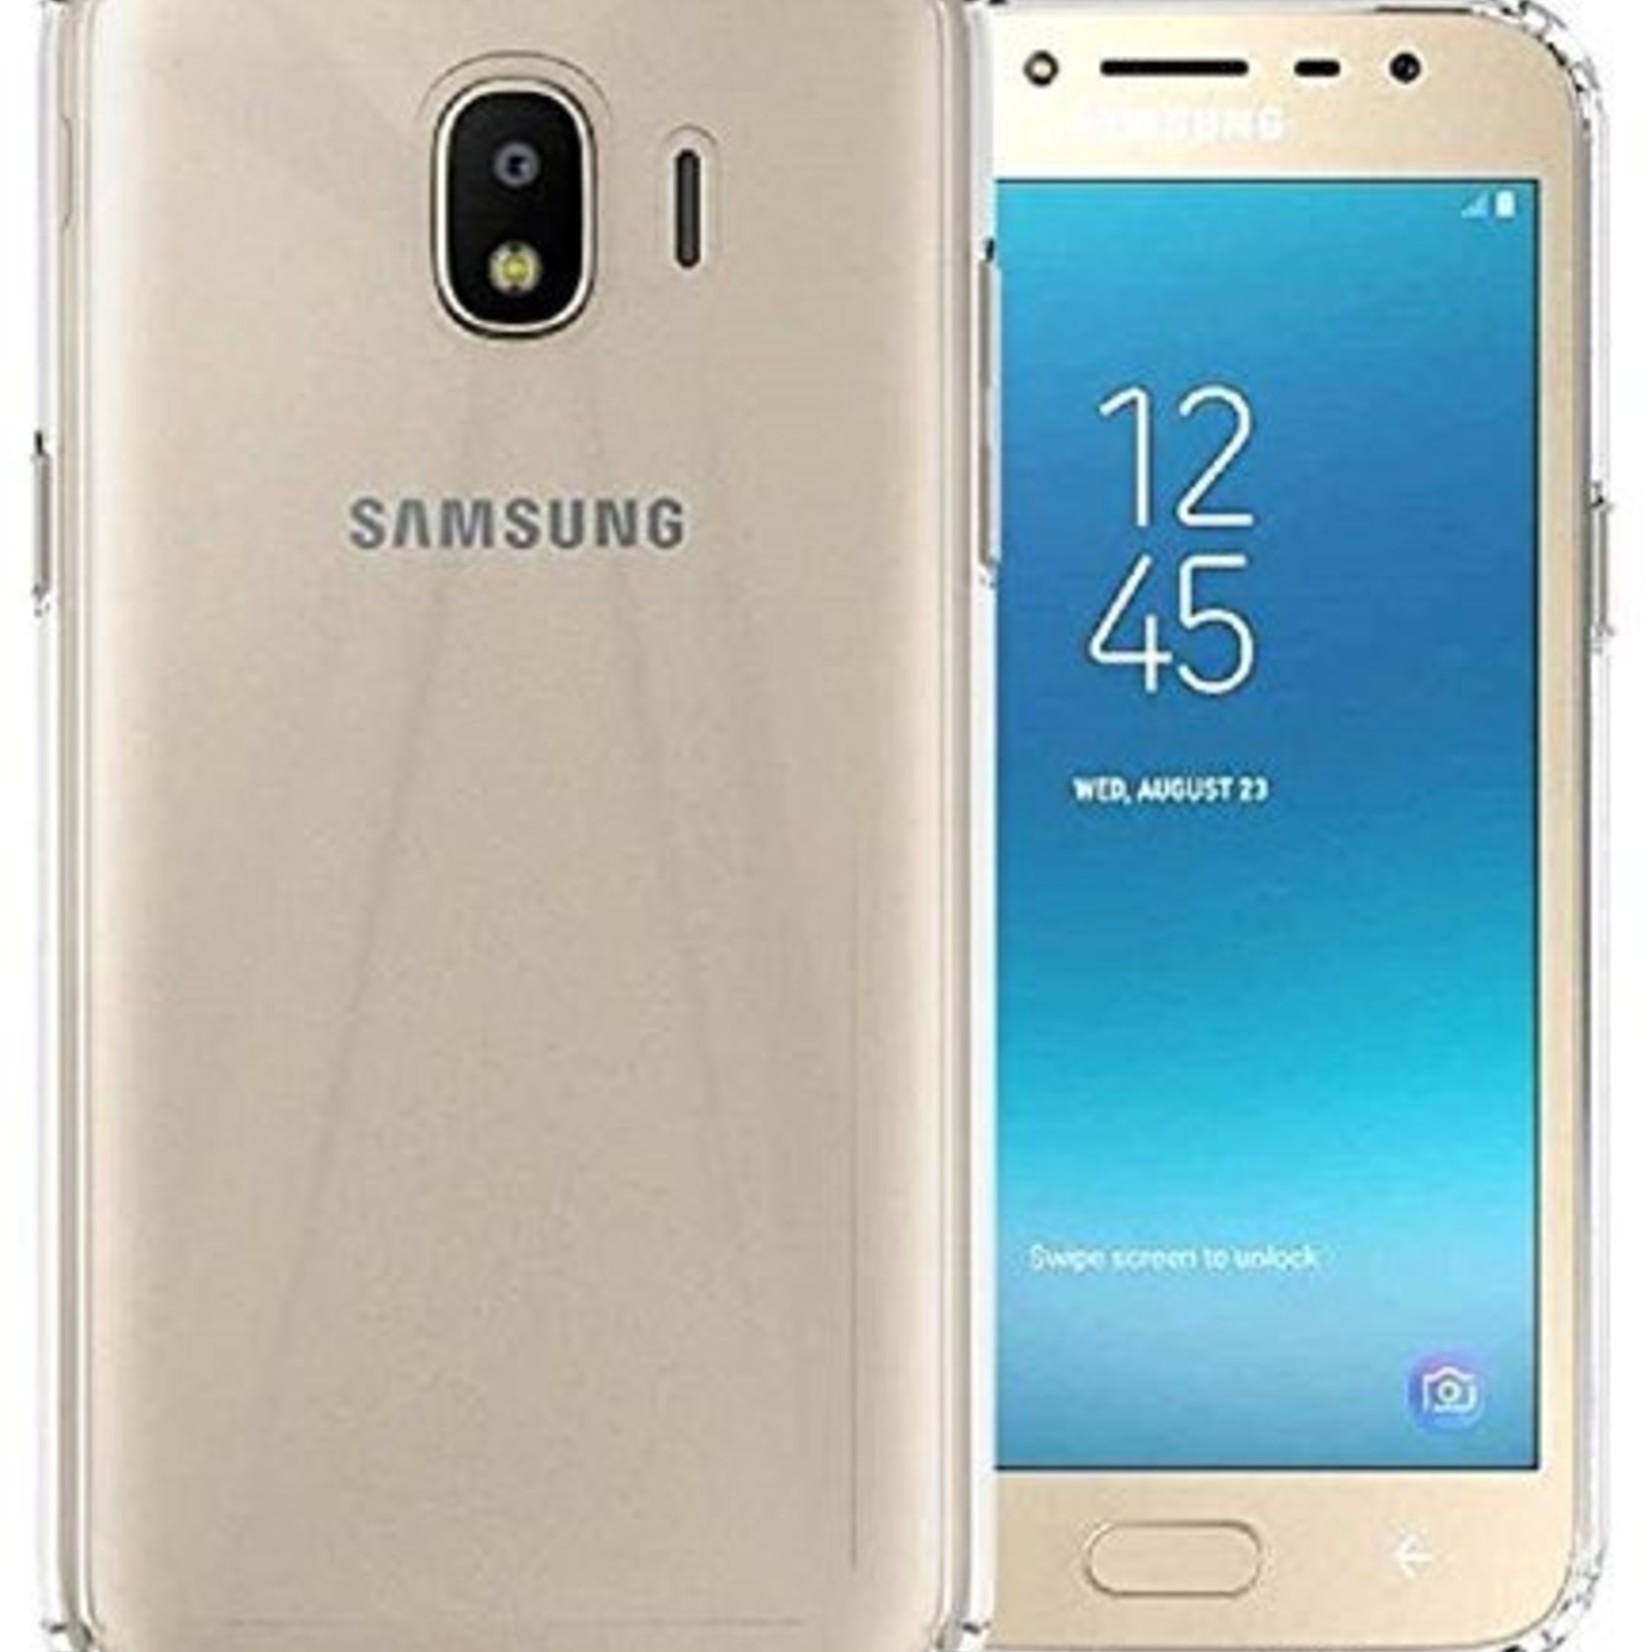 Colorfone Hoesje CoolSkin3T voor Samsung J4 2018 Transparant Wit